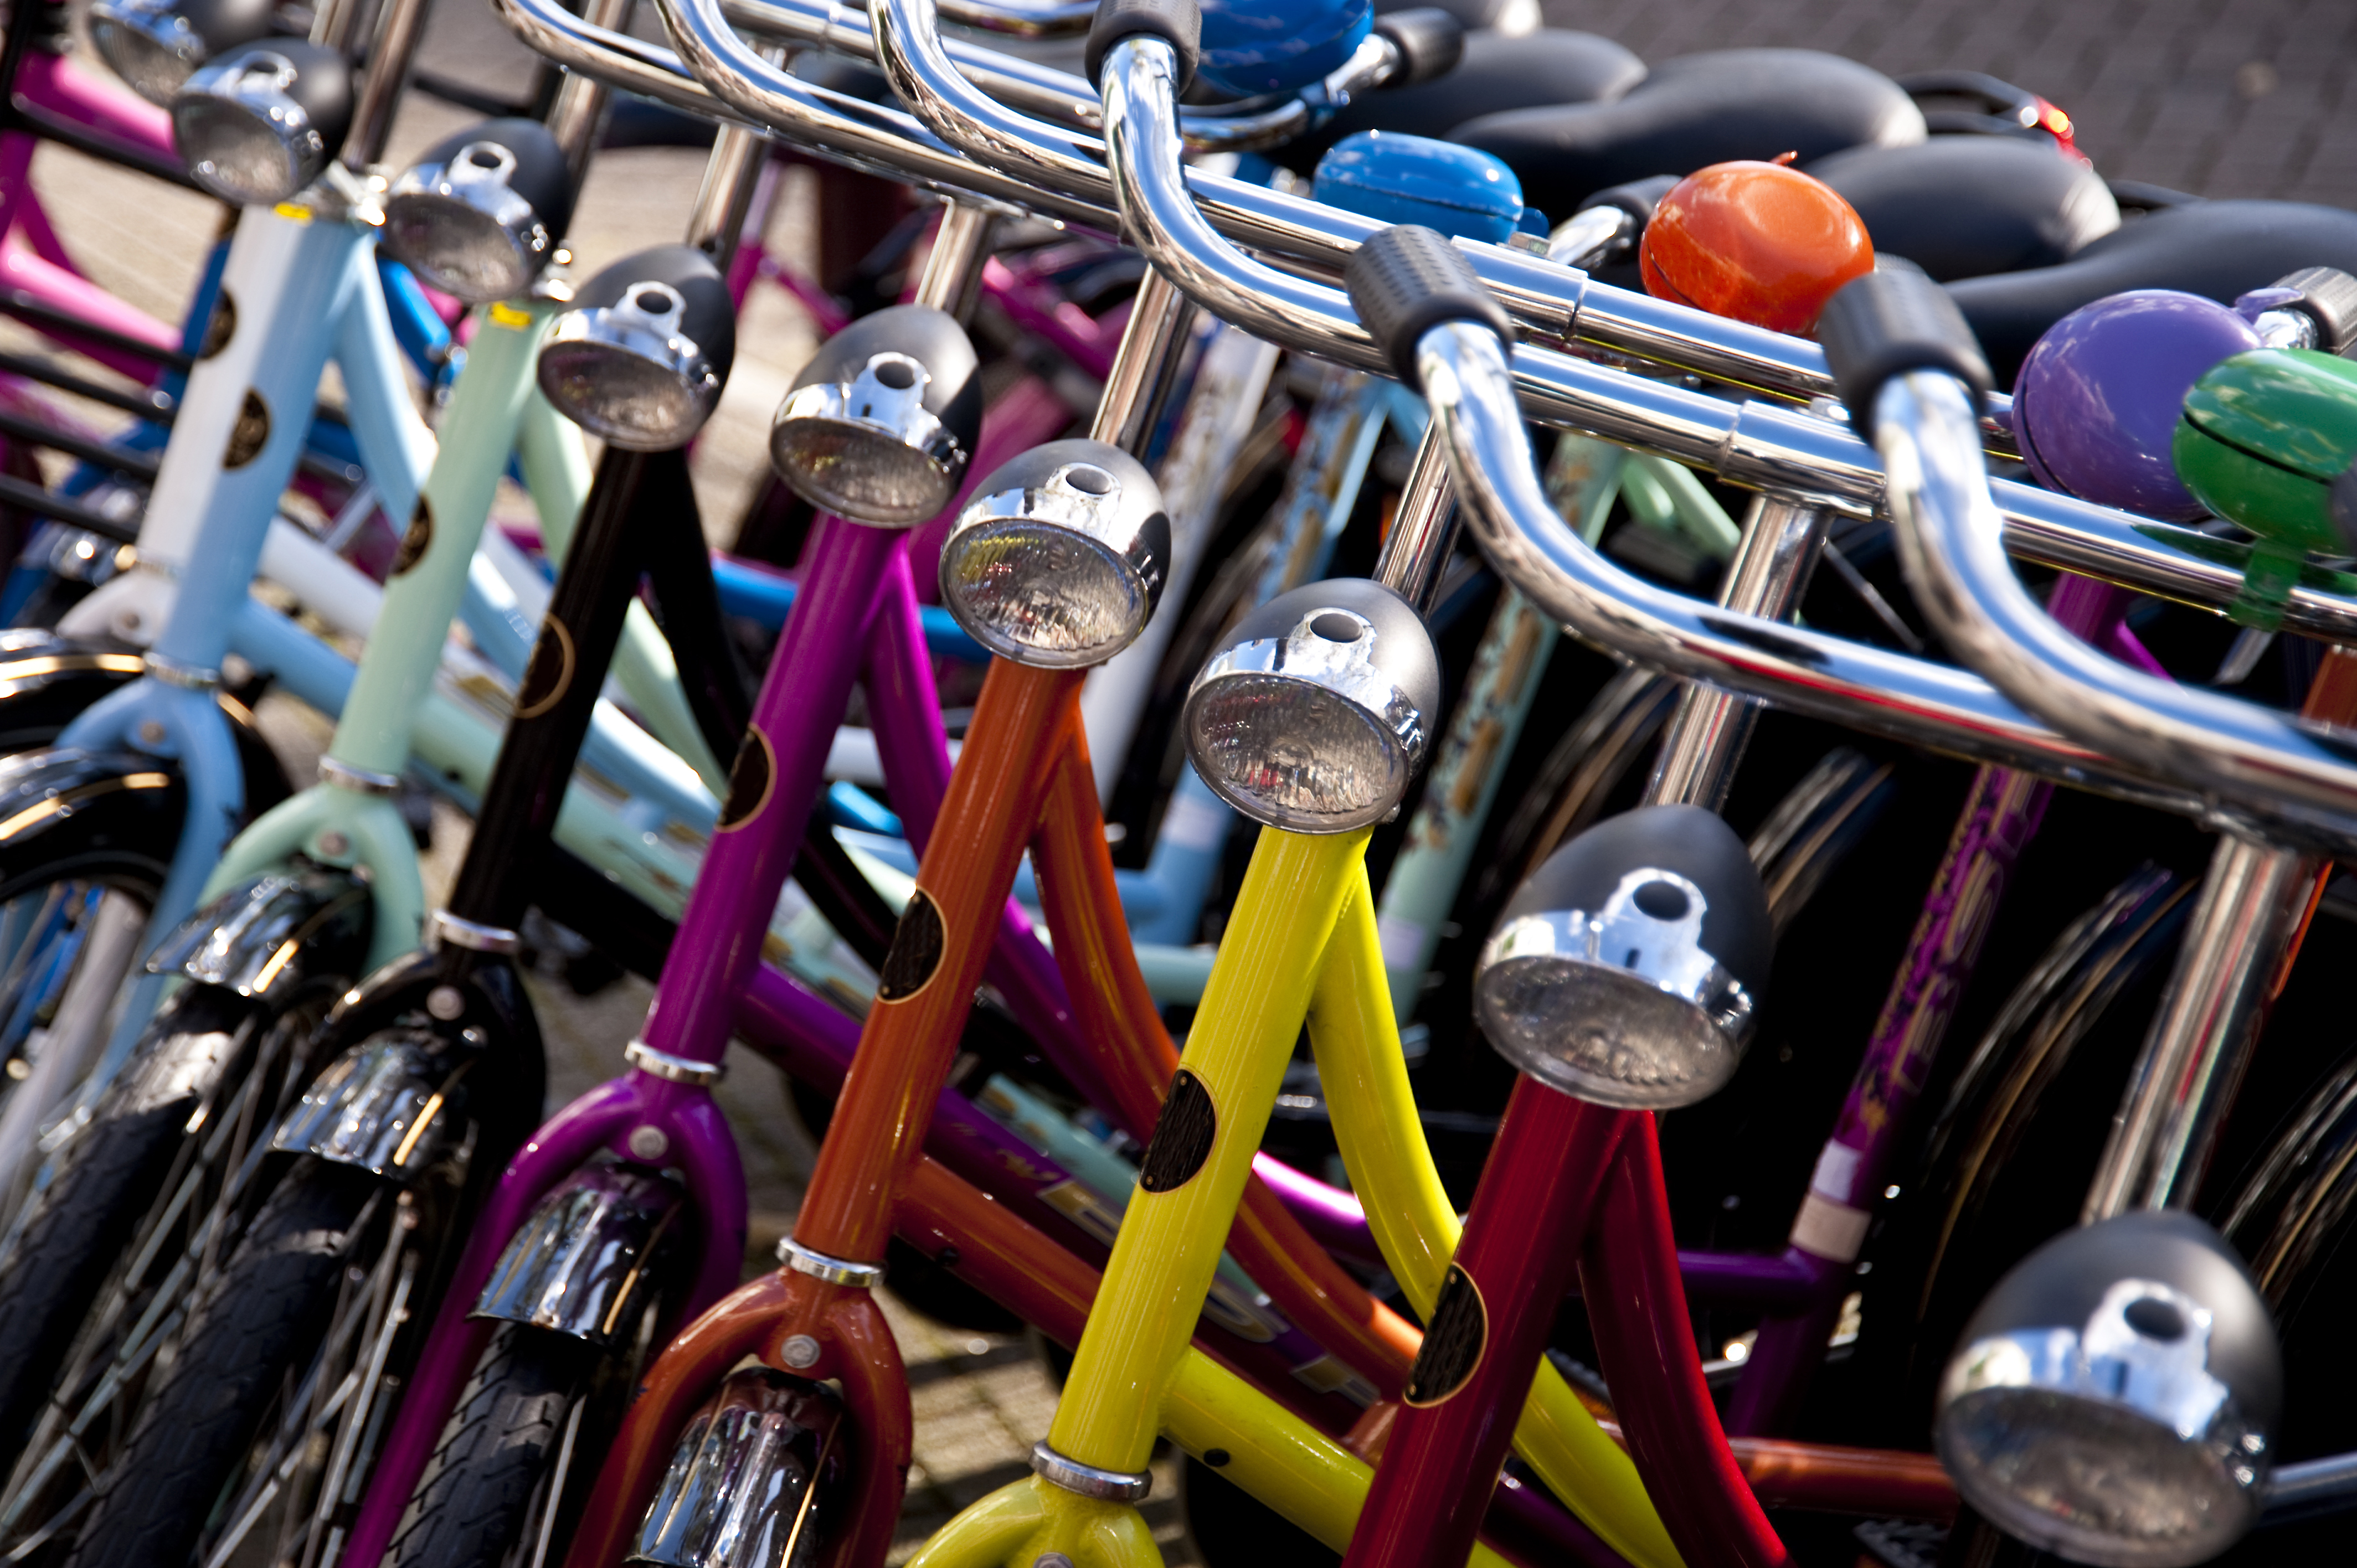 bici, biciclette, ciclismo